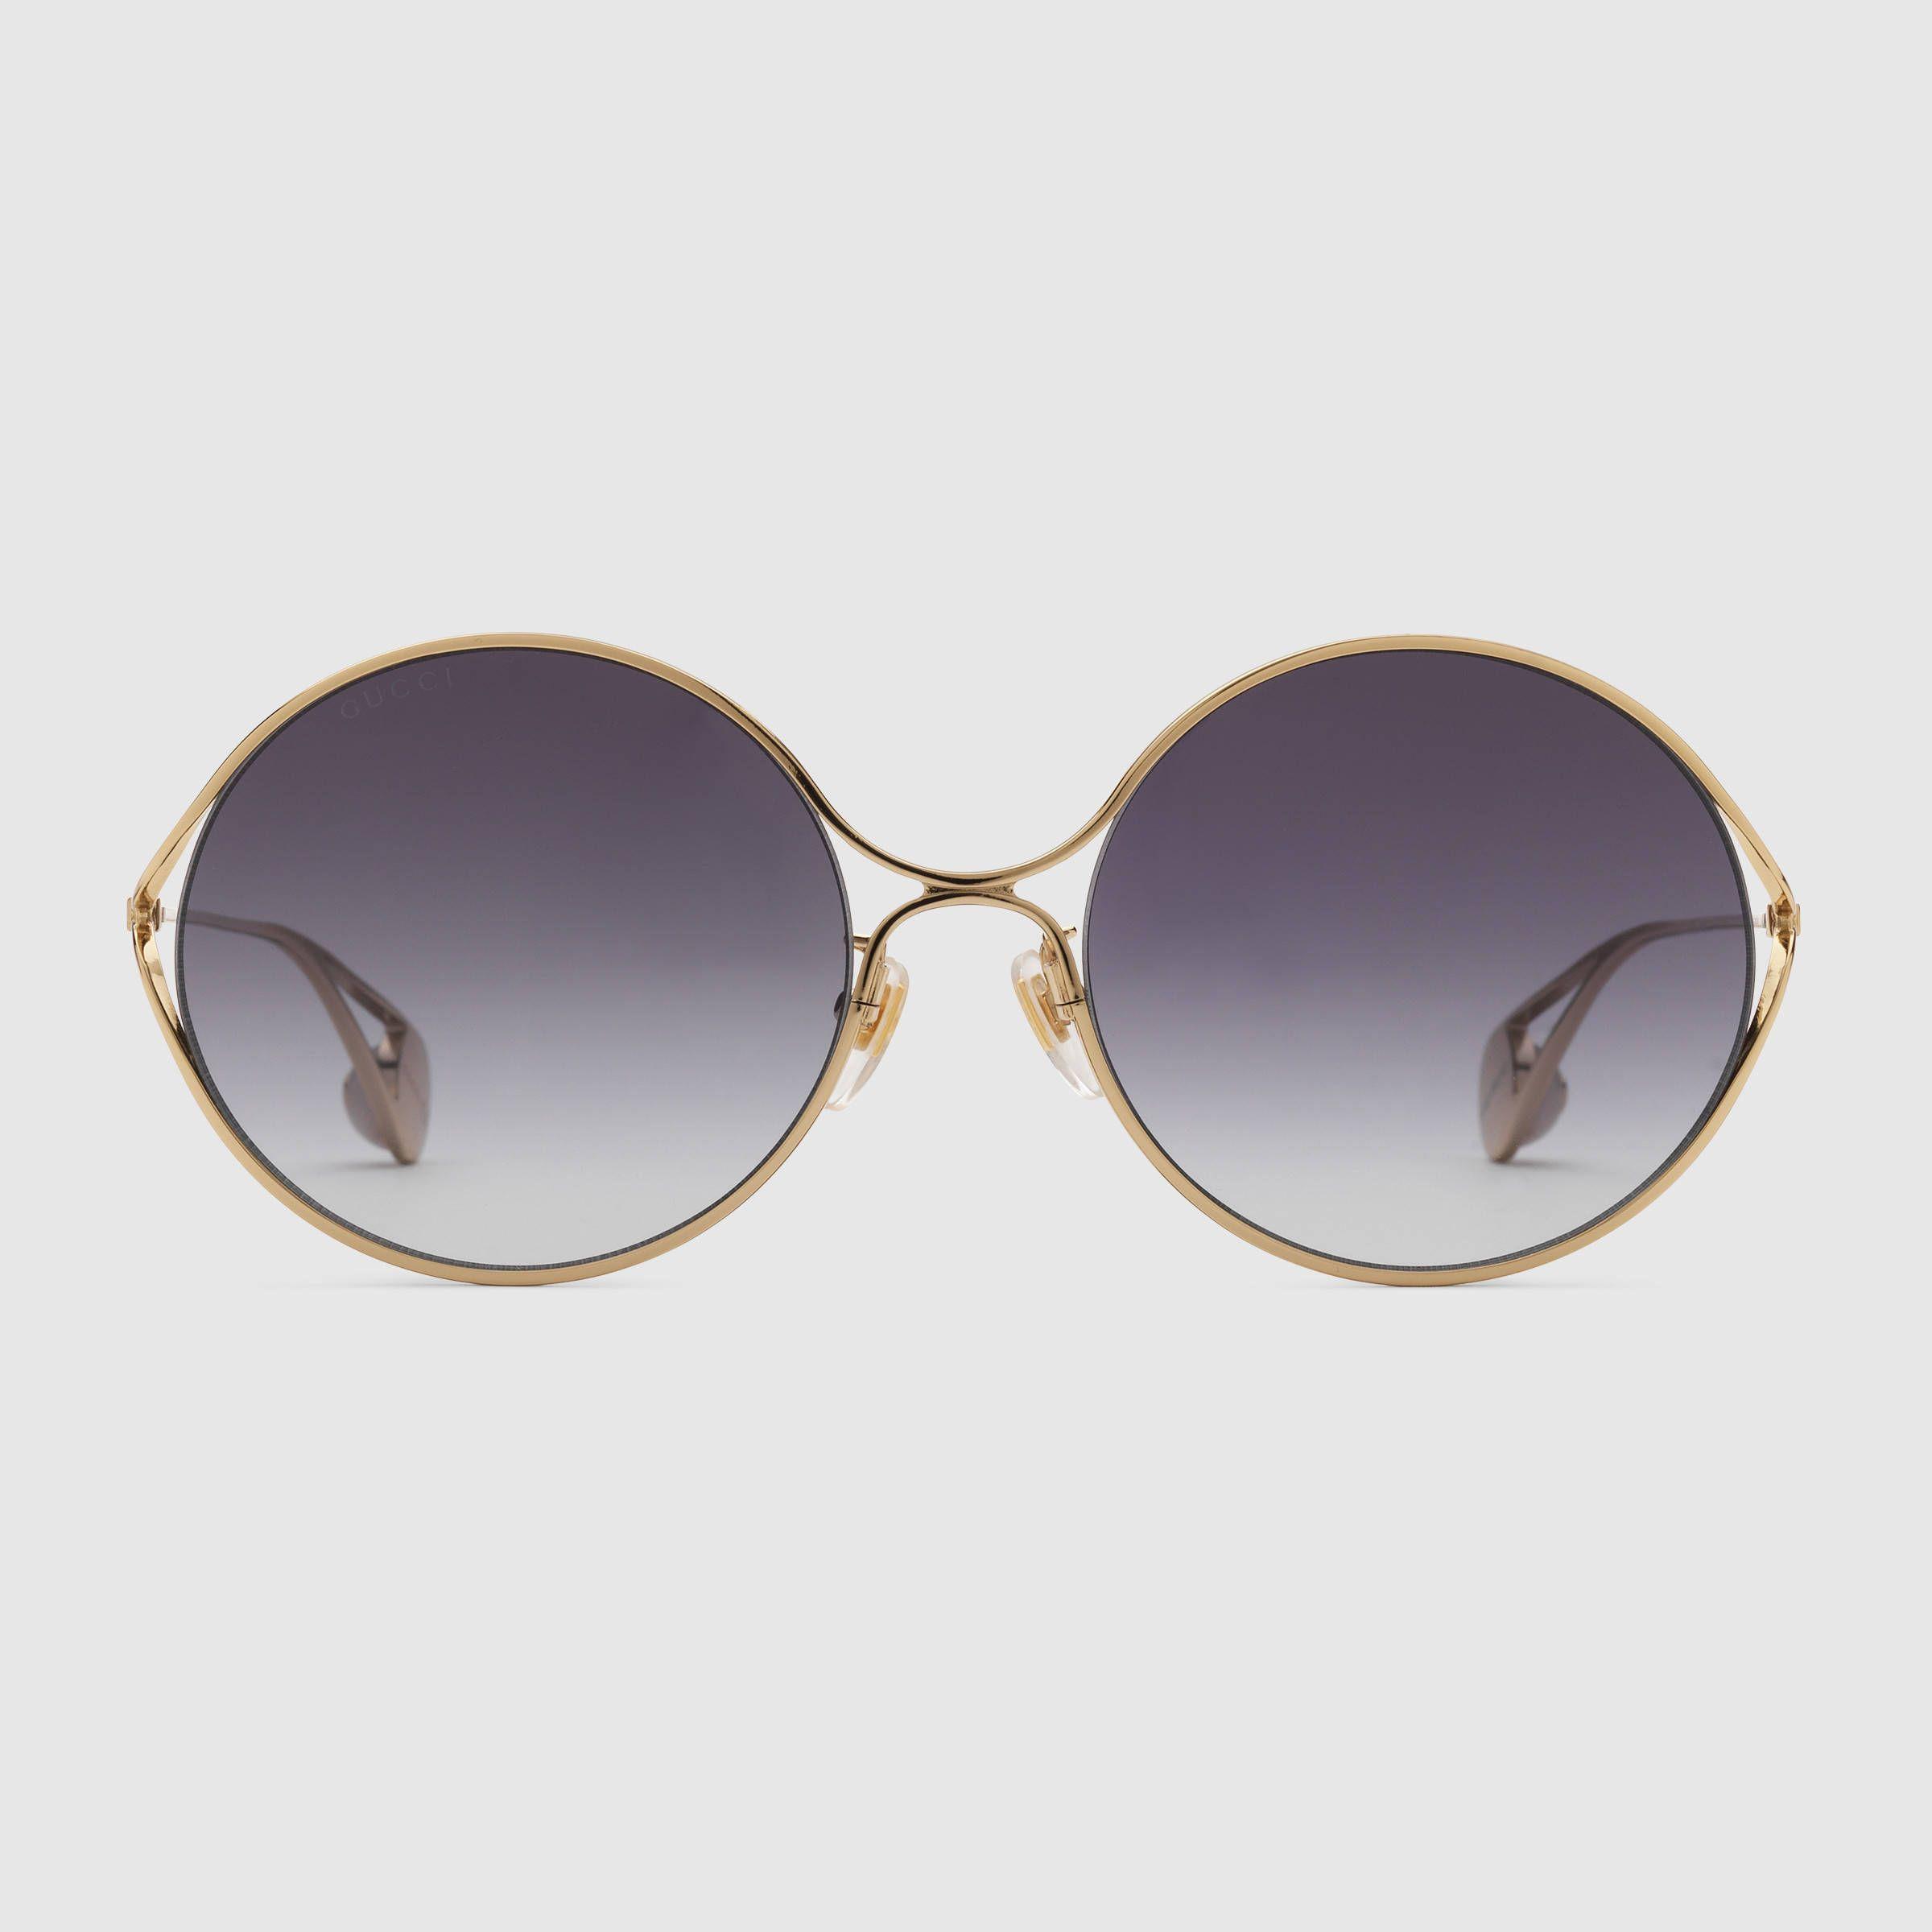 fa943c068f3 Round-frame metal sunglasses   550 Print Style 506149 I0330 8811